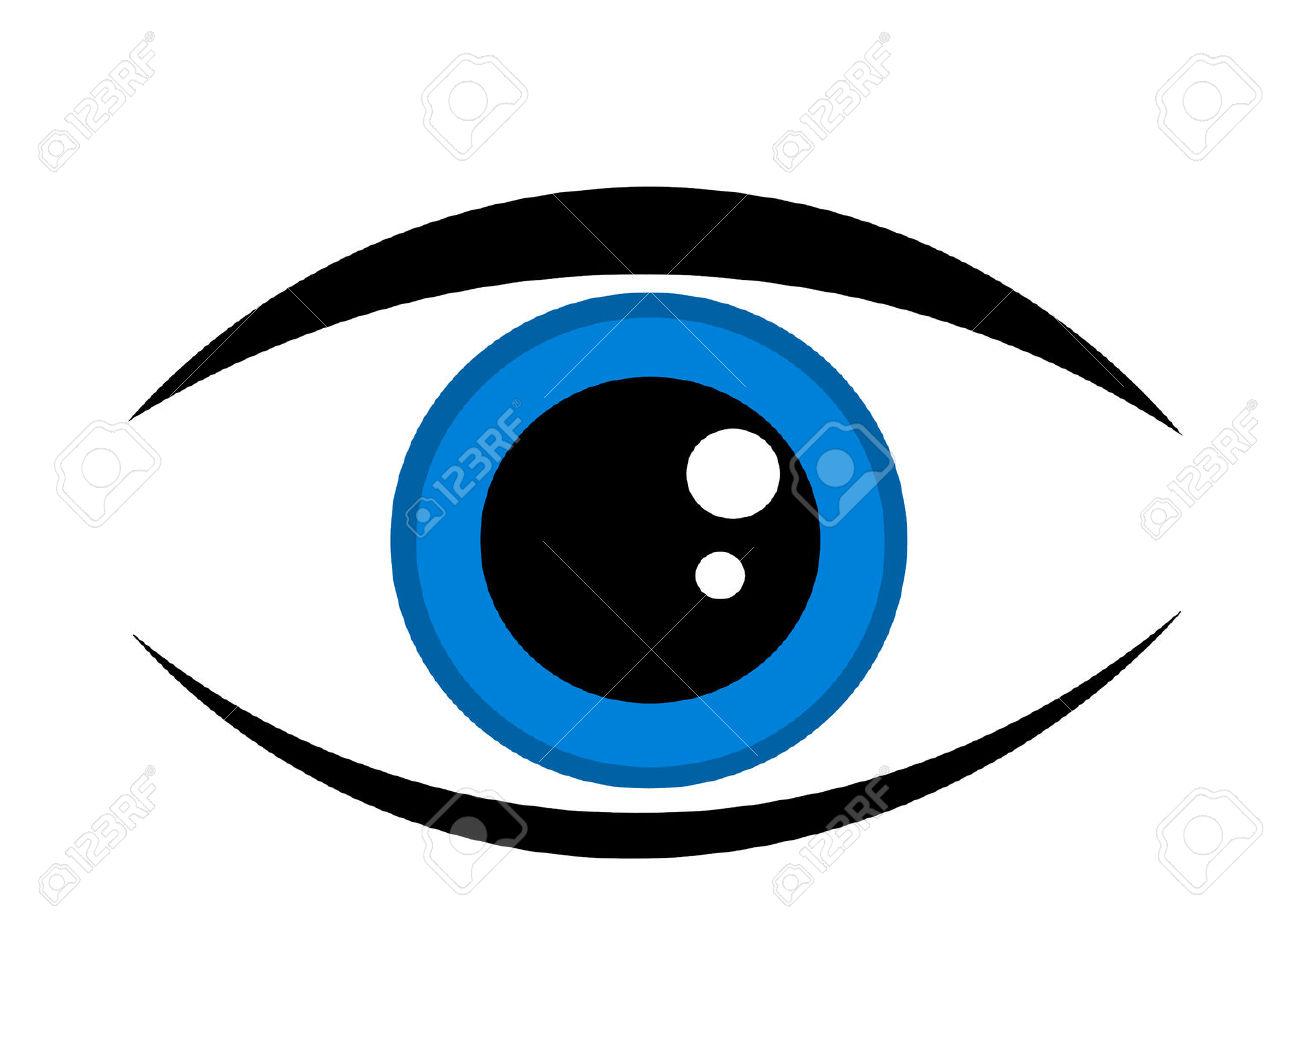 1 blue eye clipart - ClipartFest jpg transparent stock